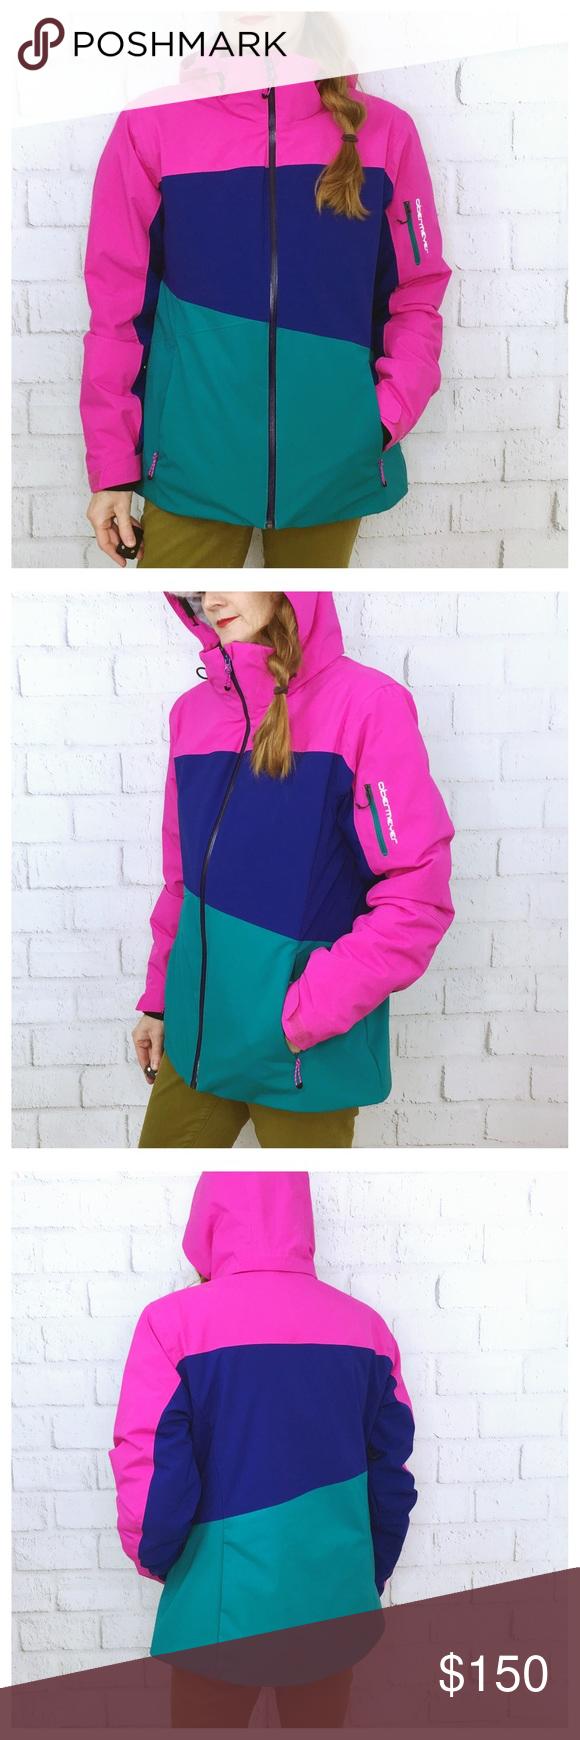 6a391773e0 Obermeyer Women s Luna Ski Jacket. Size 12 Obermeyer Women s Ski Jacket.  Size 12 NWOT